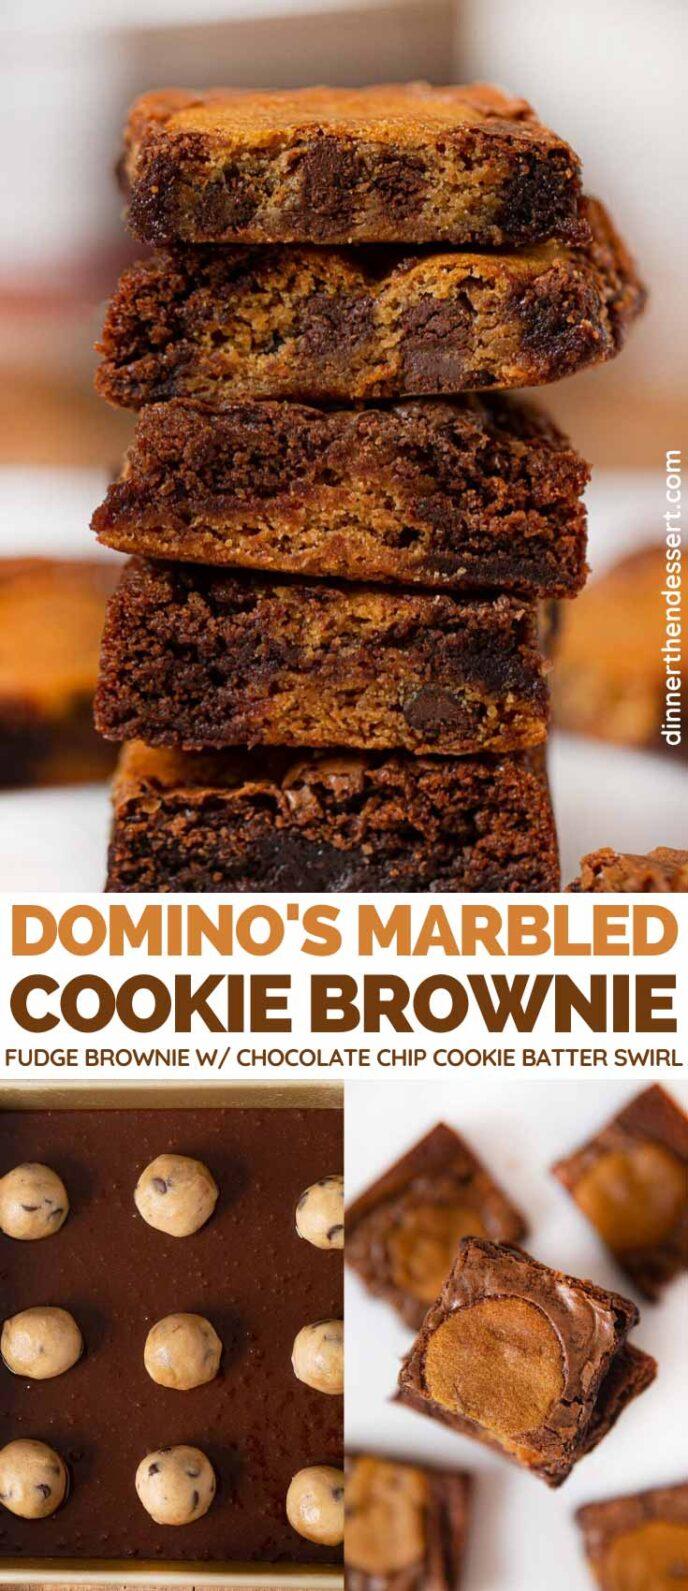 Domino's Cookie Brownie Copycat collage